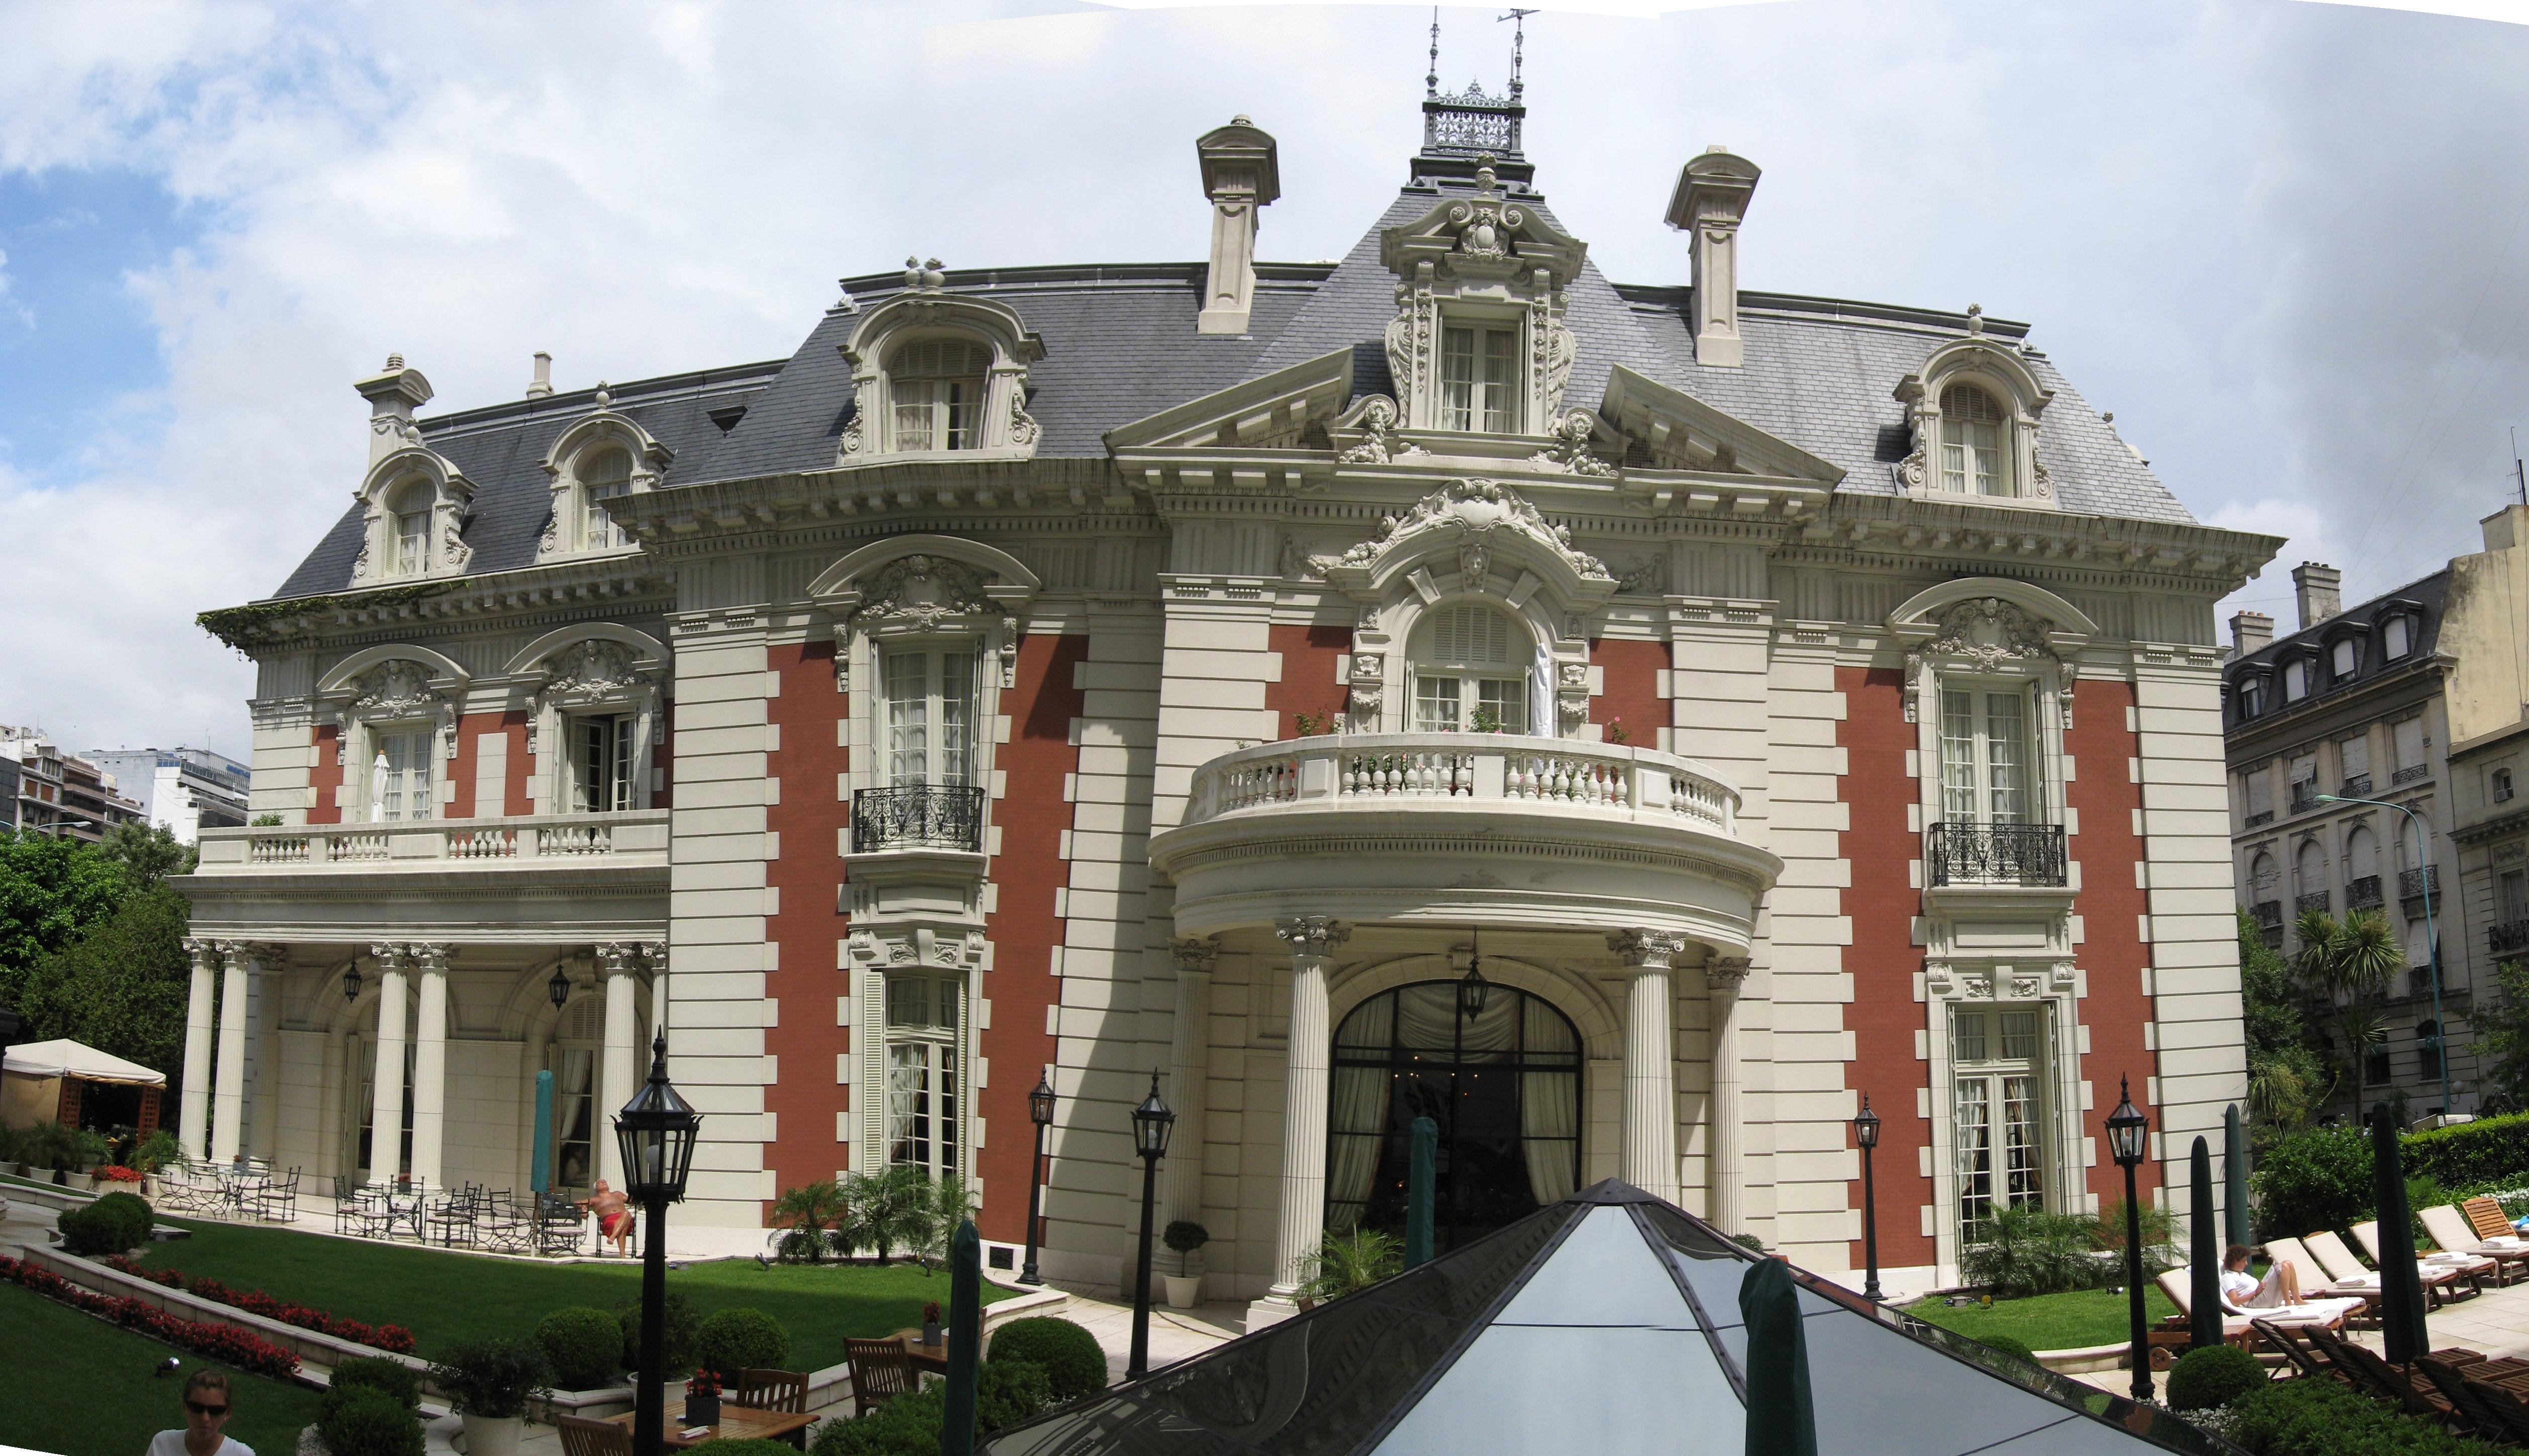 VIP TOURS BA - EXPERIENCES IN BUENOS AIRES - ARGENTINA - PALACE ÁLZAGA UNZUÉ